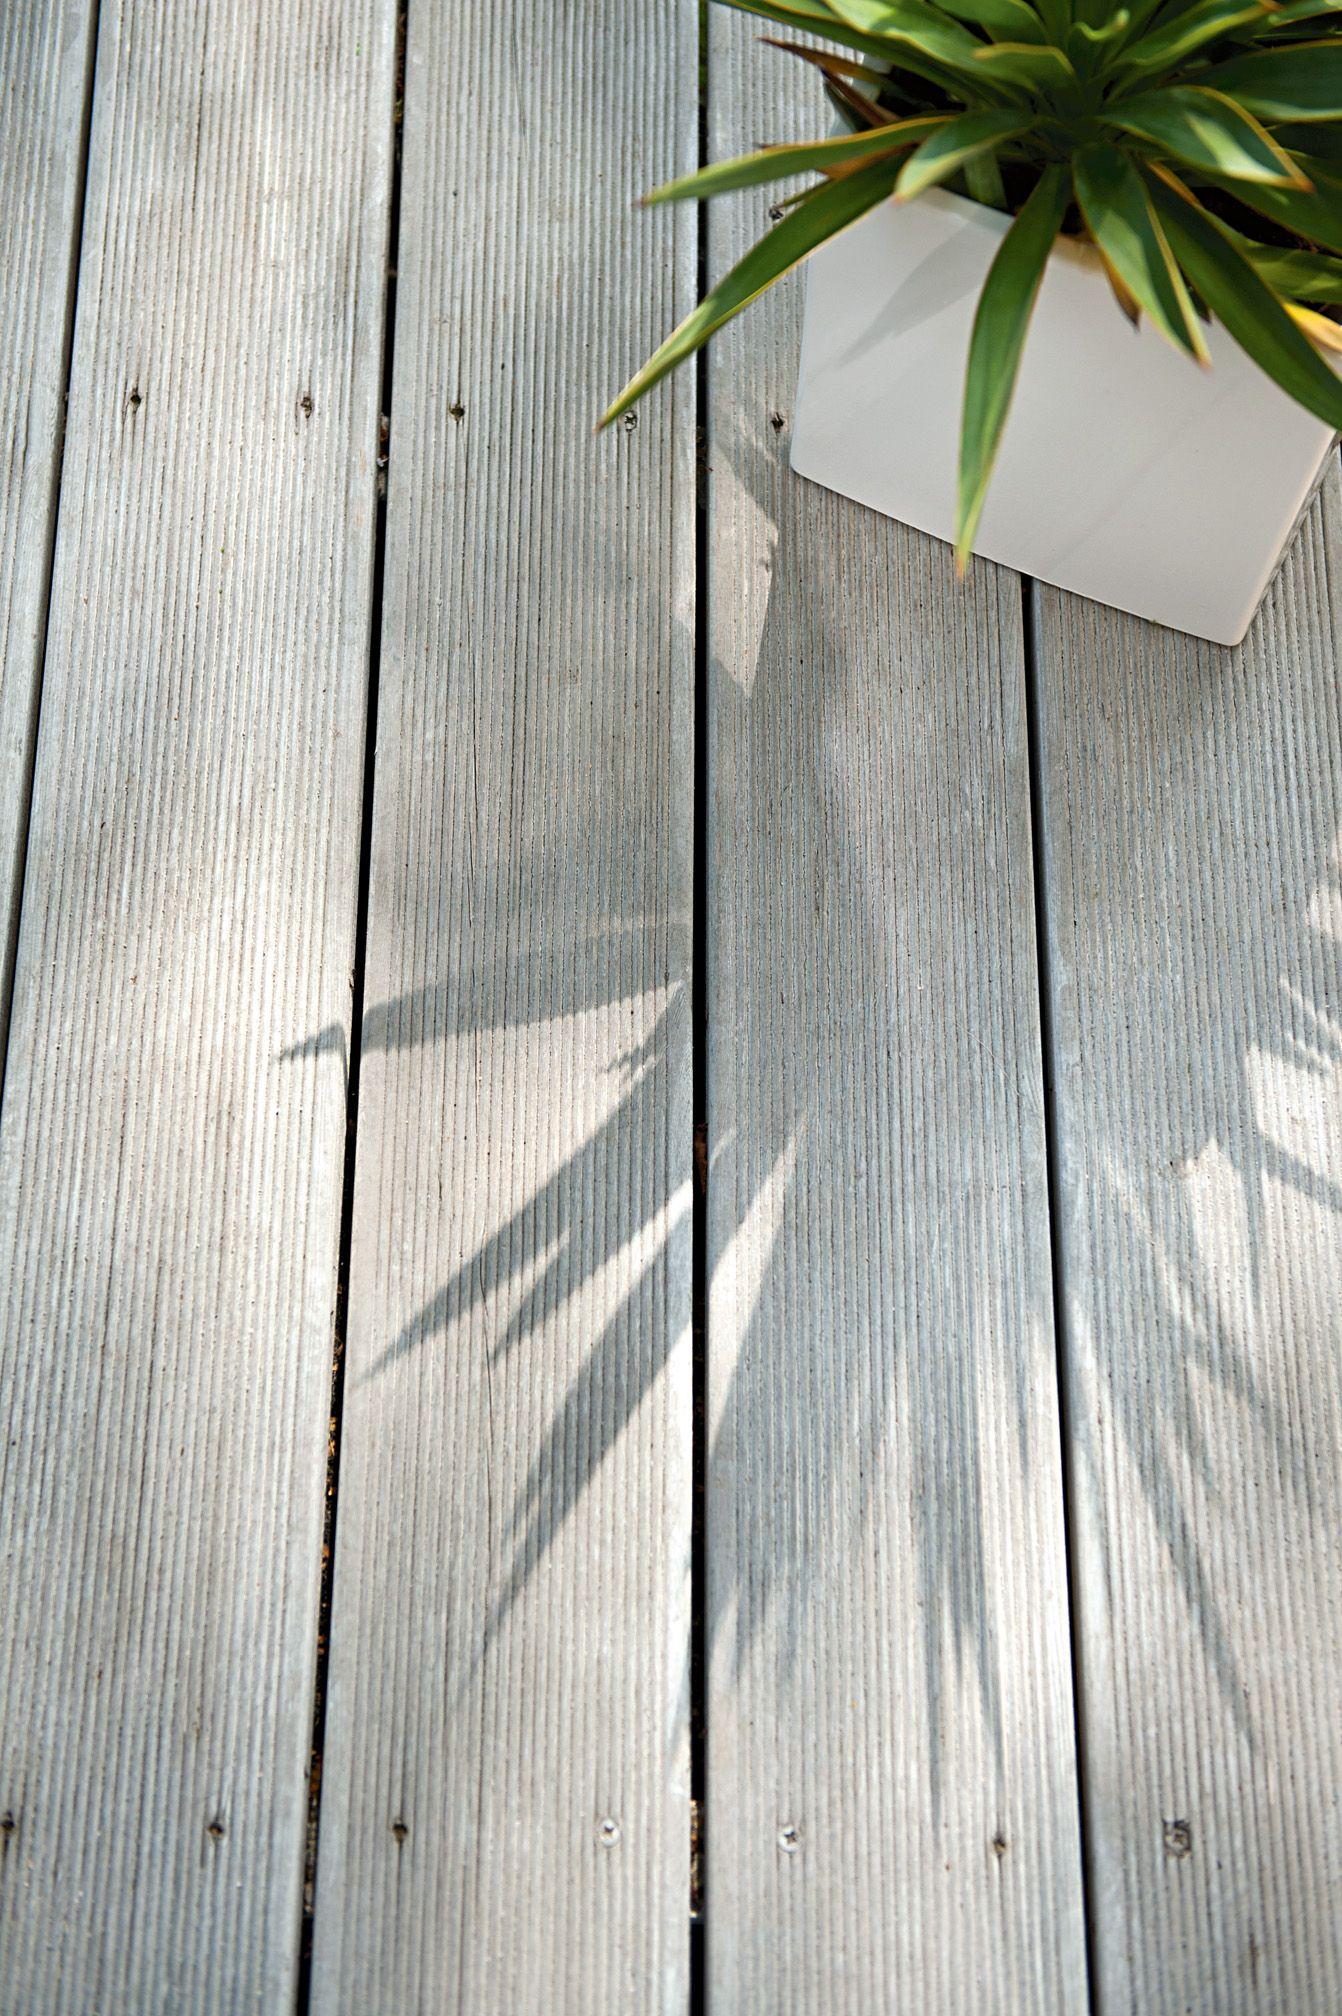 Http Www Castorama Pl Katalog Ogrod 2015 Plant Leaves Plants Photography